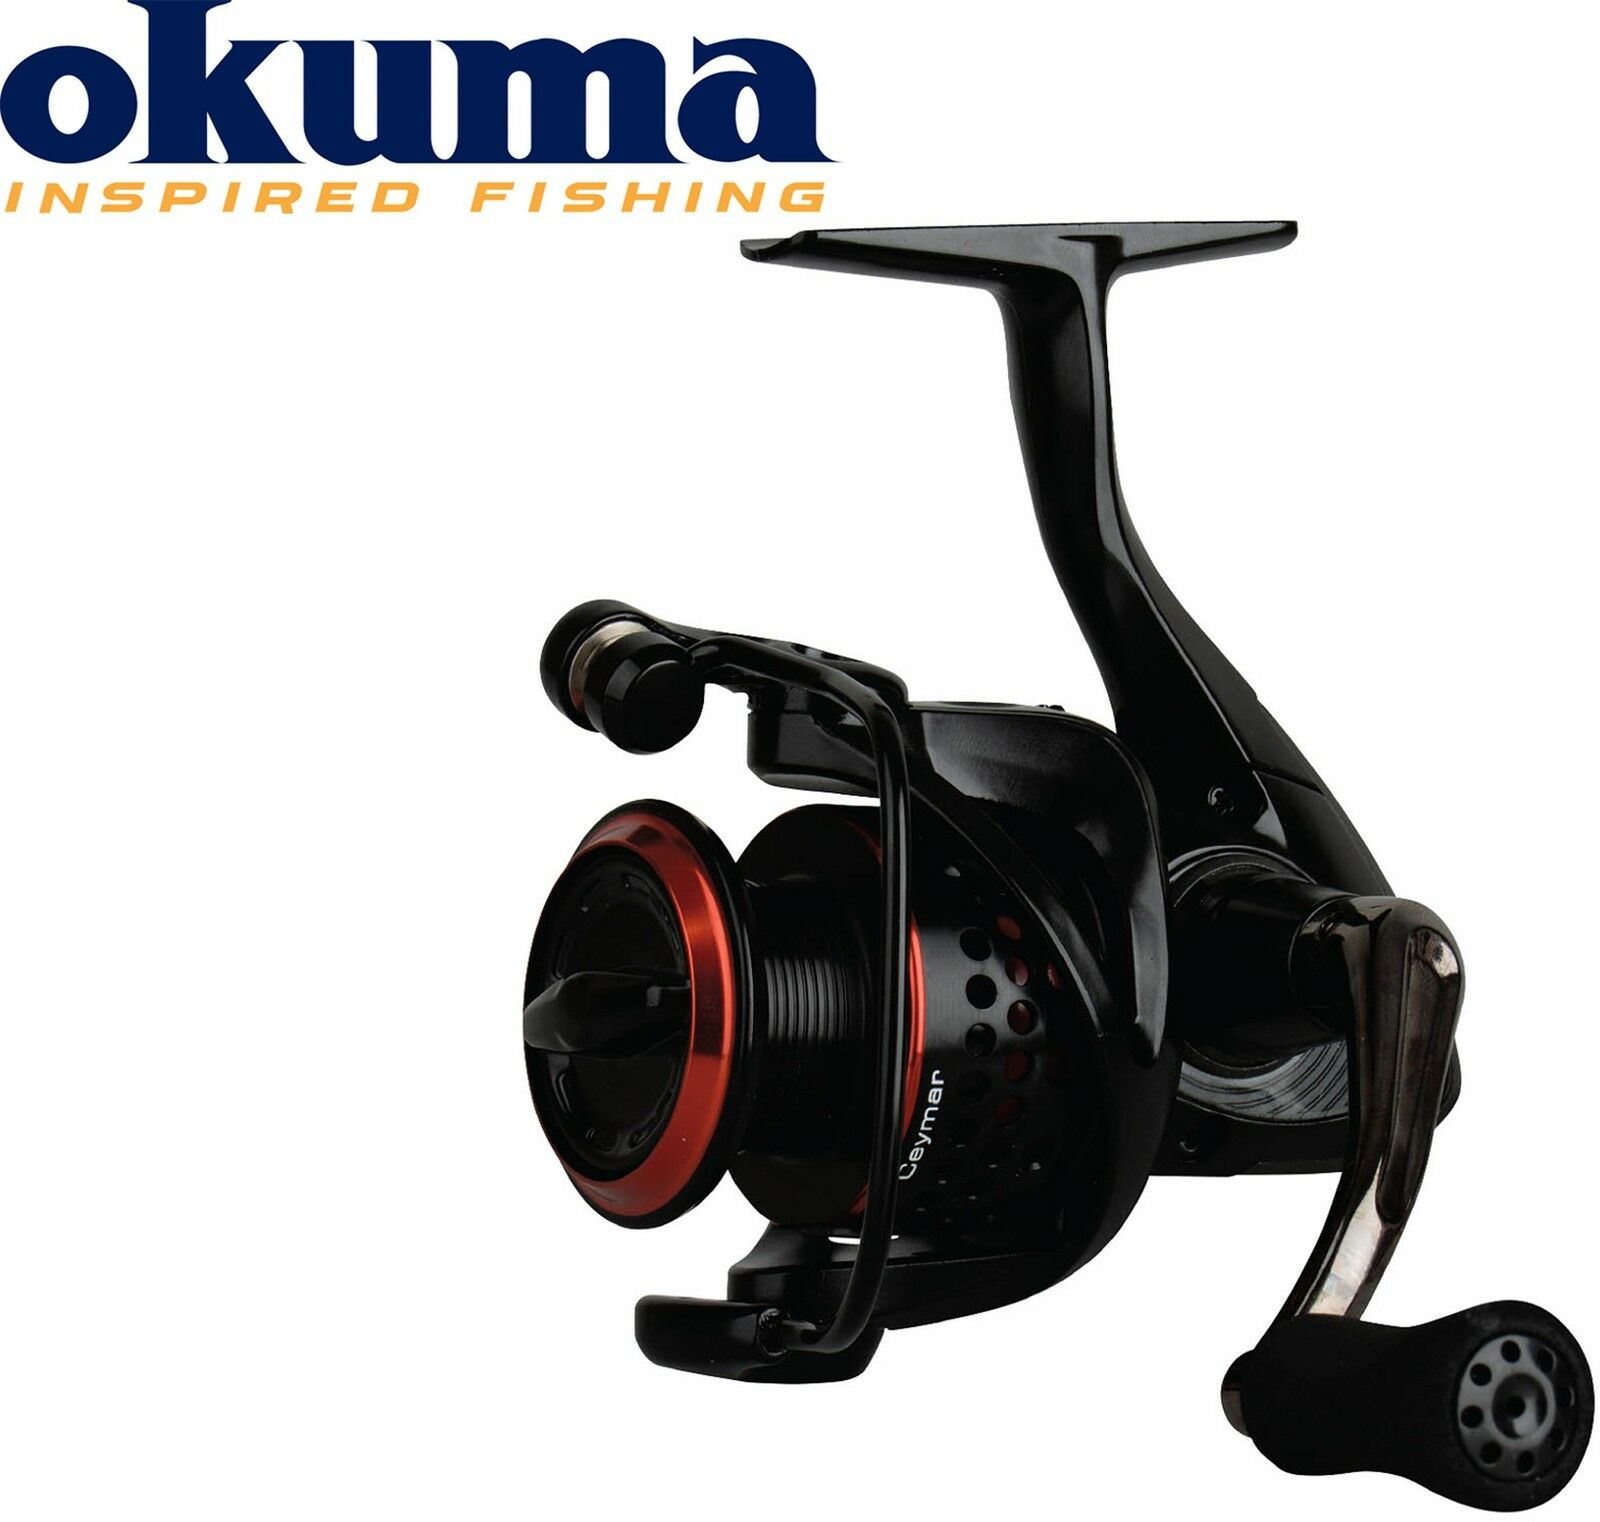 Okuma Ceymar XT CXT-40 Rolle Rolle Rolle – 240m 0,25mm Schnurfassung, Stationärrolle ffe5ba